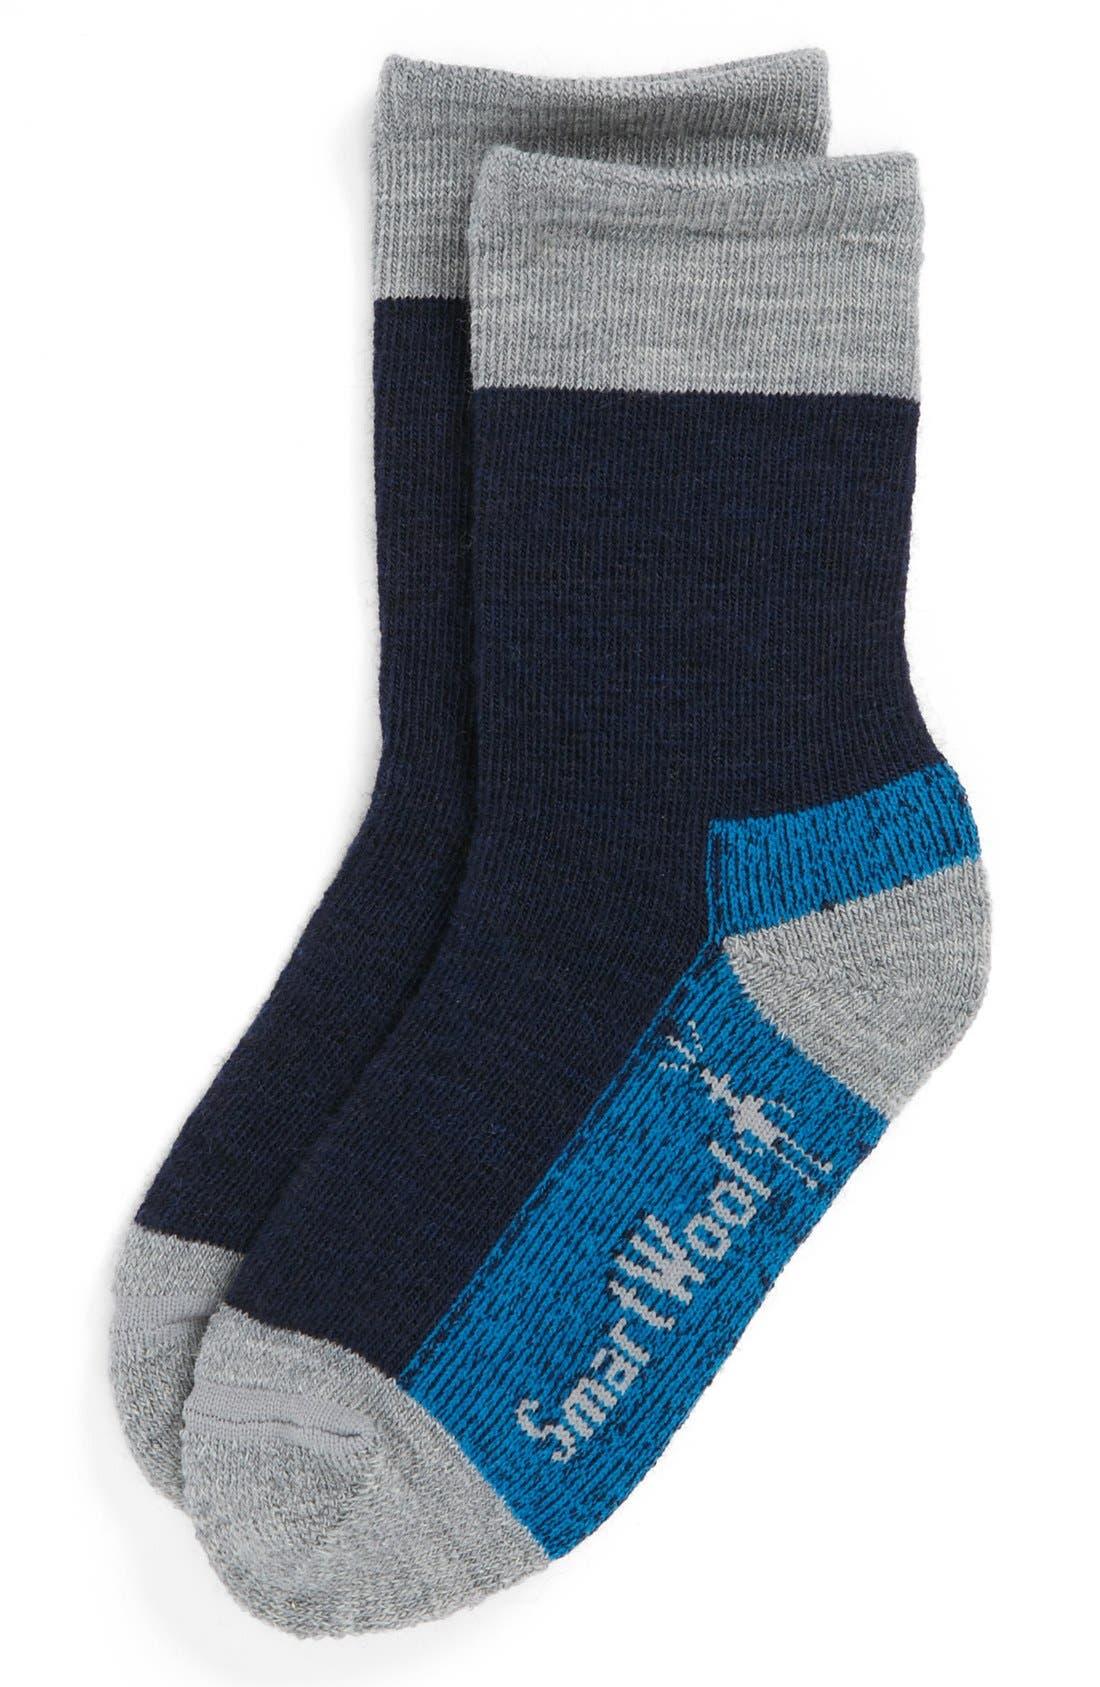 Main Image - Smartwool 'Hikerstreet' Socks (Toddler, Little Boys & Big Boys)